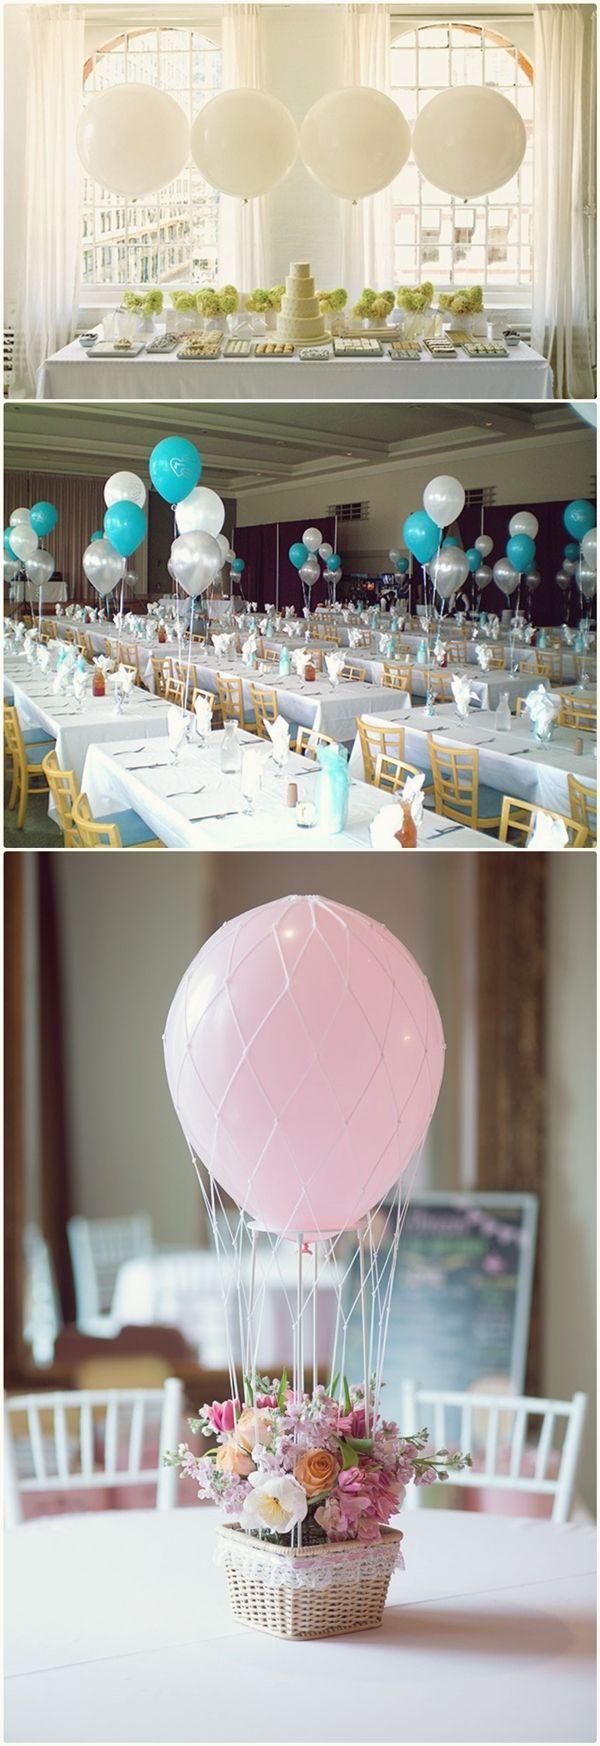 Wedding decoration ideas balloons  Unique Centerpieces For Weddings Colourfull Balloon  visit